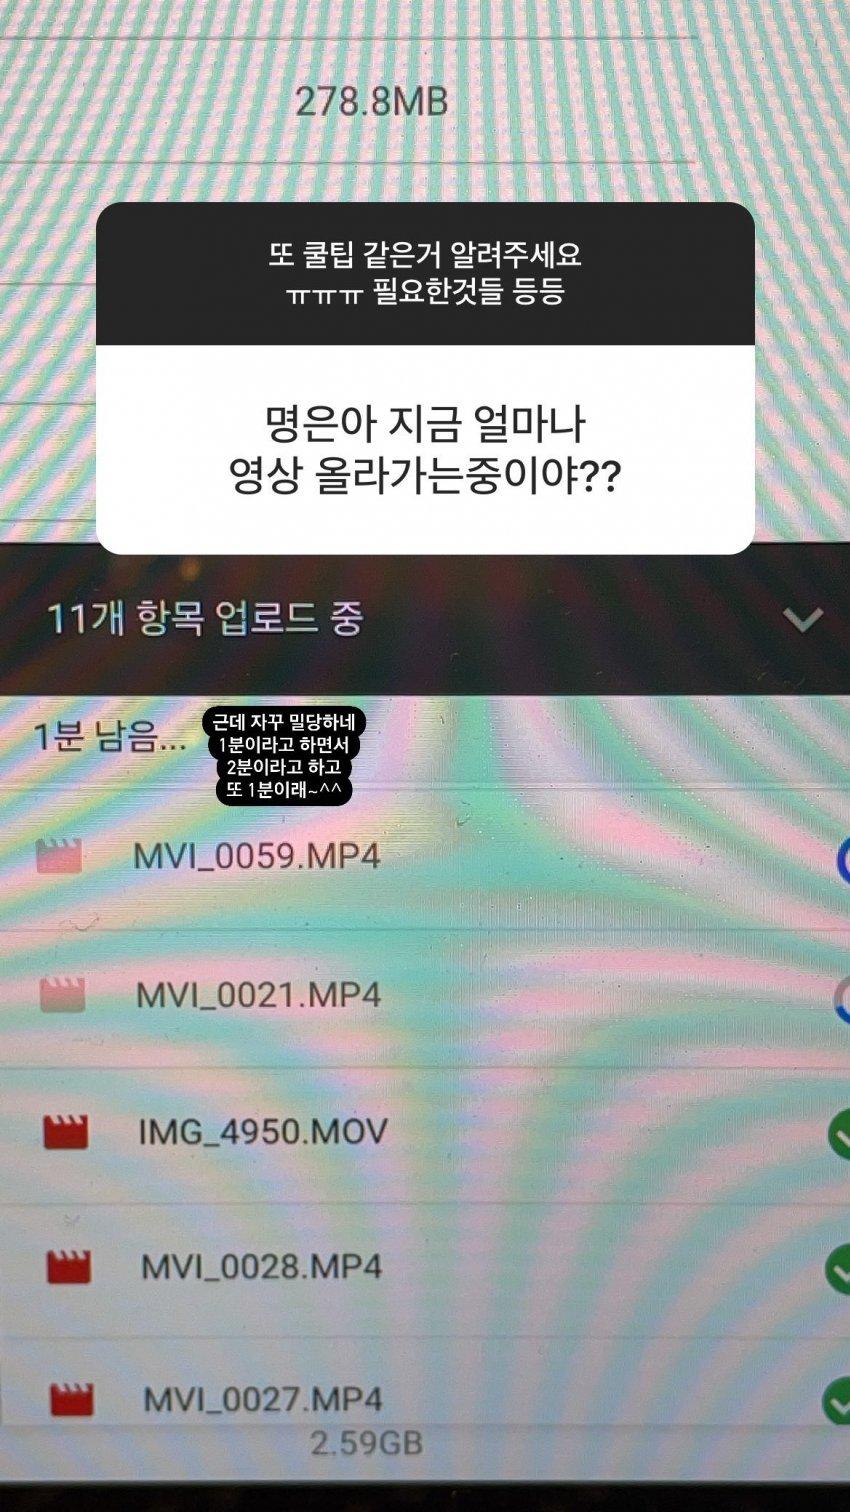 viewimage.php?id=21b2c623e9cb22&no=24b0d769e1d32ca73ceb86fa11d02831eebc6c37c2fa034916fac403212305e65007efdba8e78335cd0c012233c6f763e4ade35726ee673dd9a8b7ba2648d169a50abb295e32c0e9dcce41a3b327948f1f6a1aed62abcf07a7c0